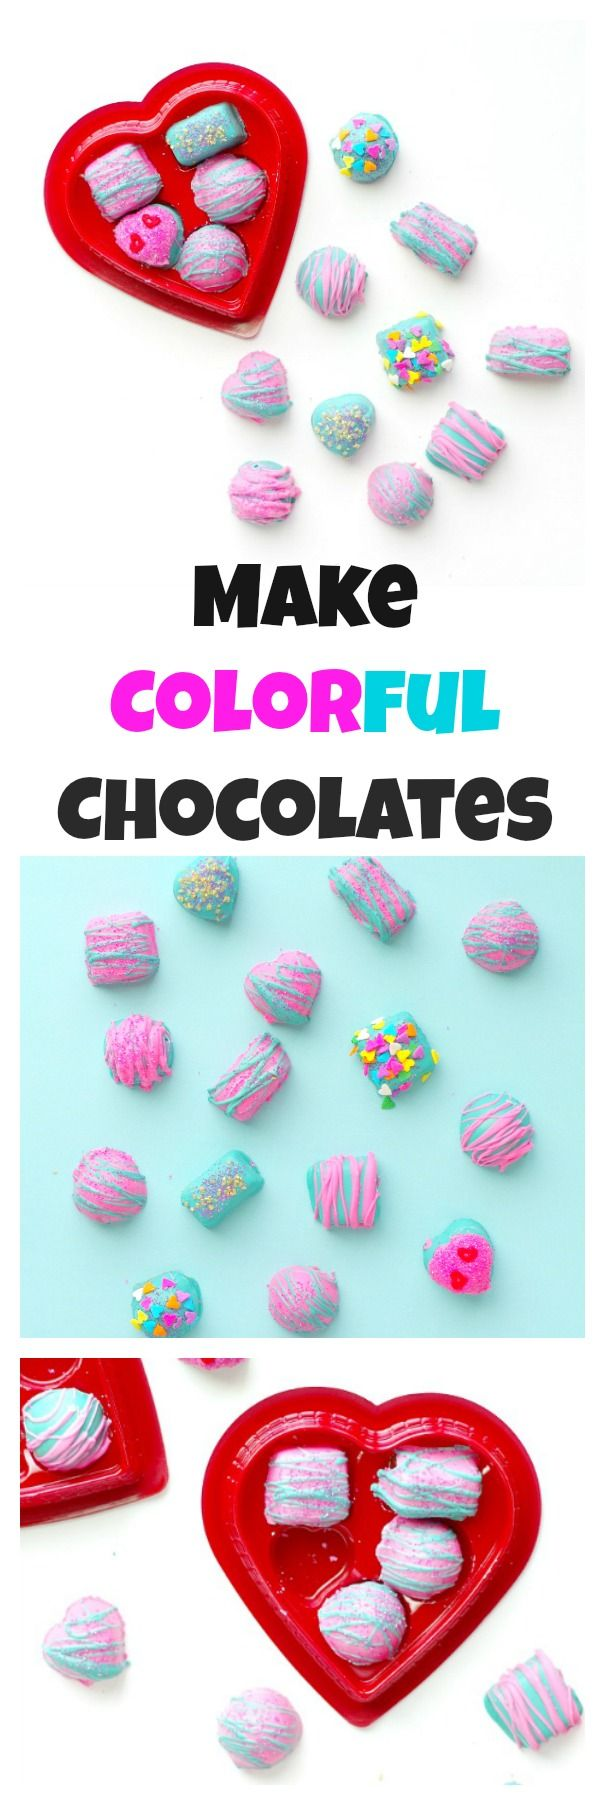 Make Colorful Chocolates